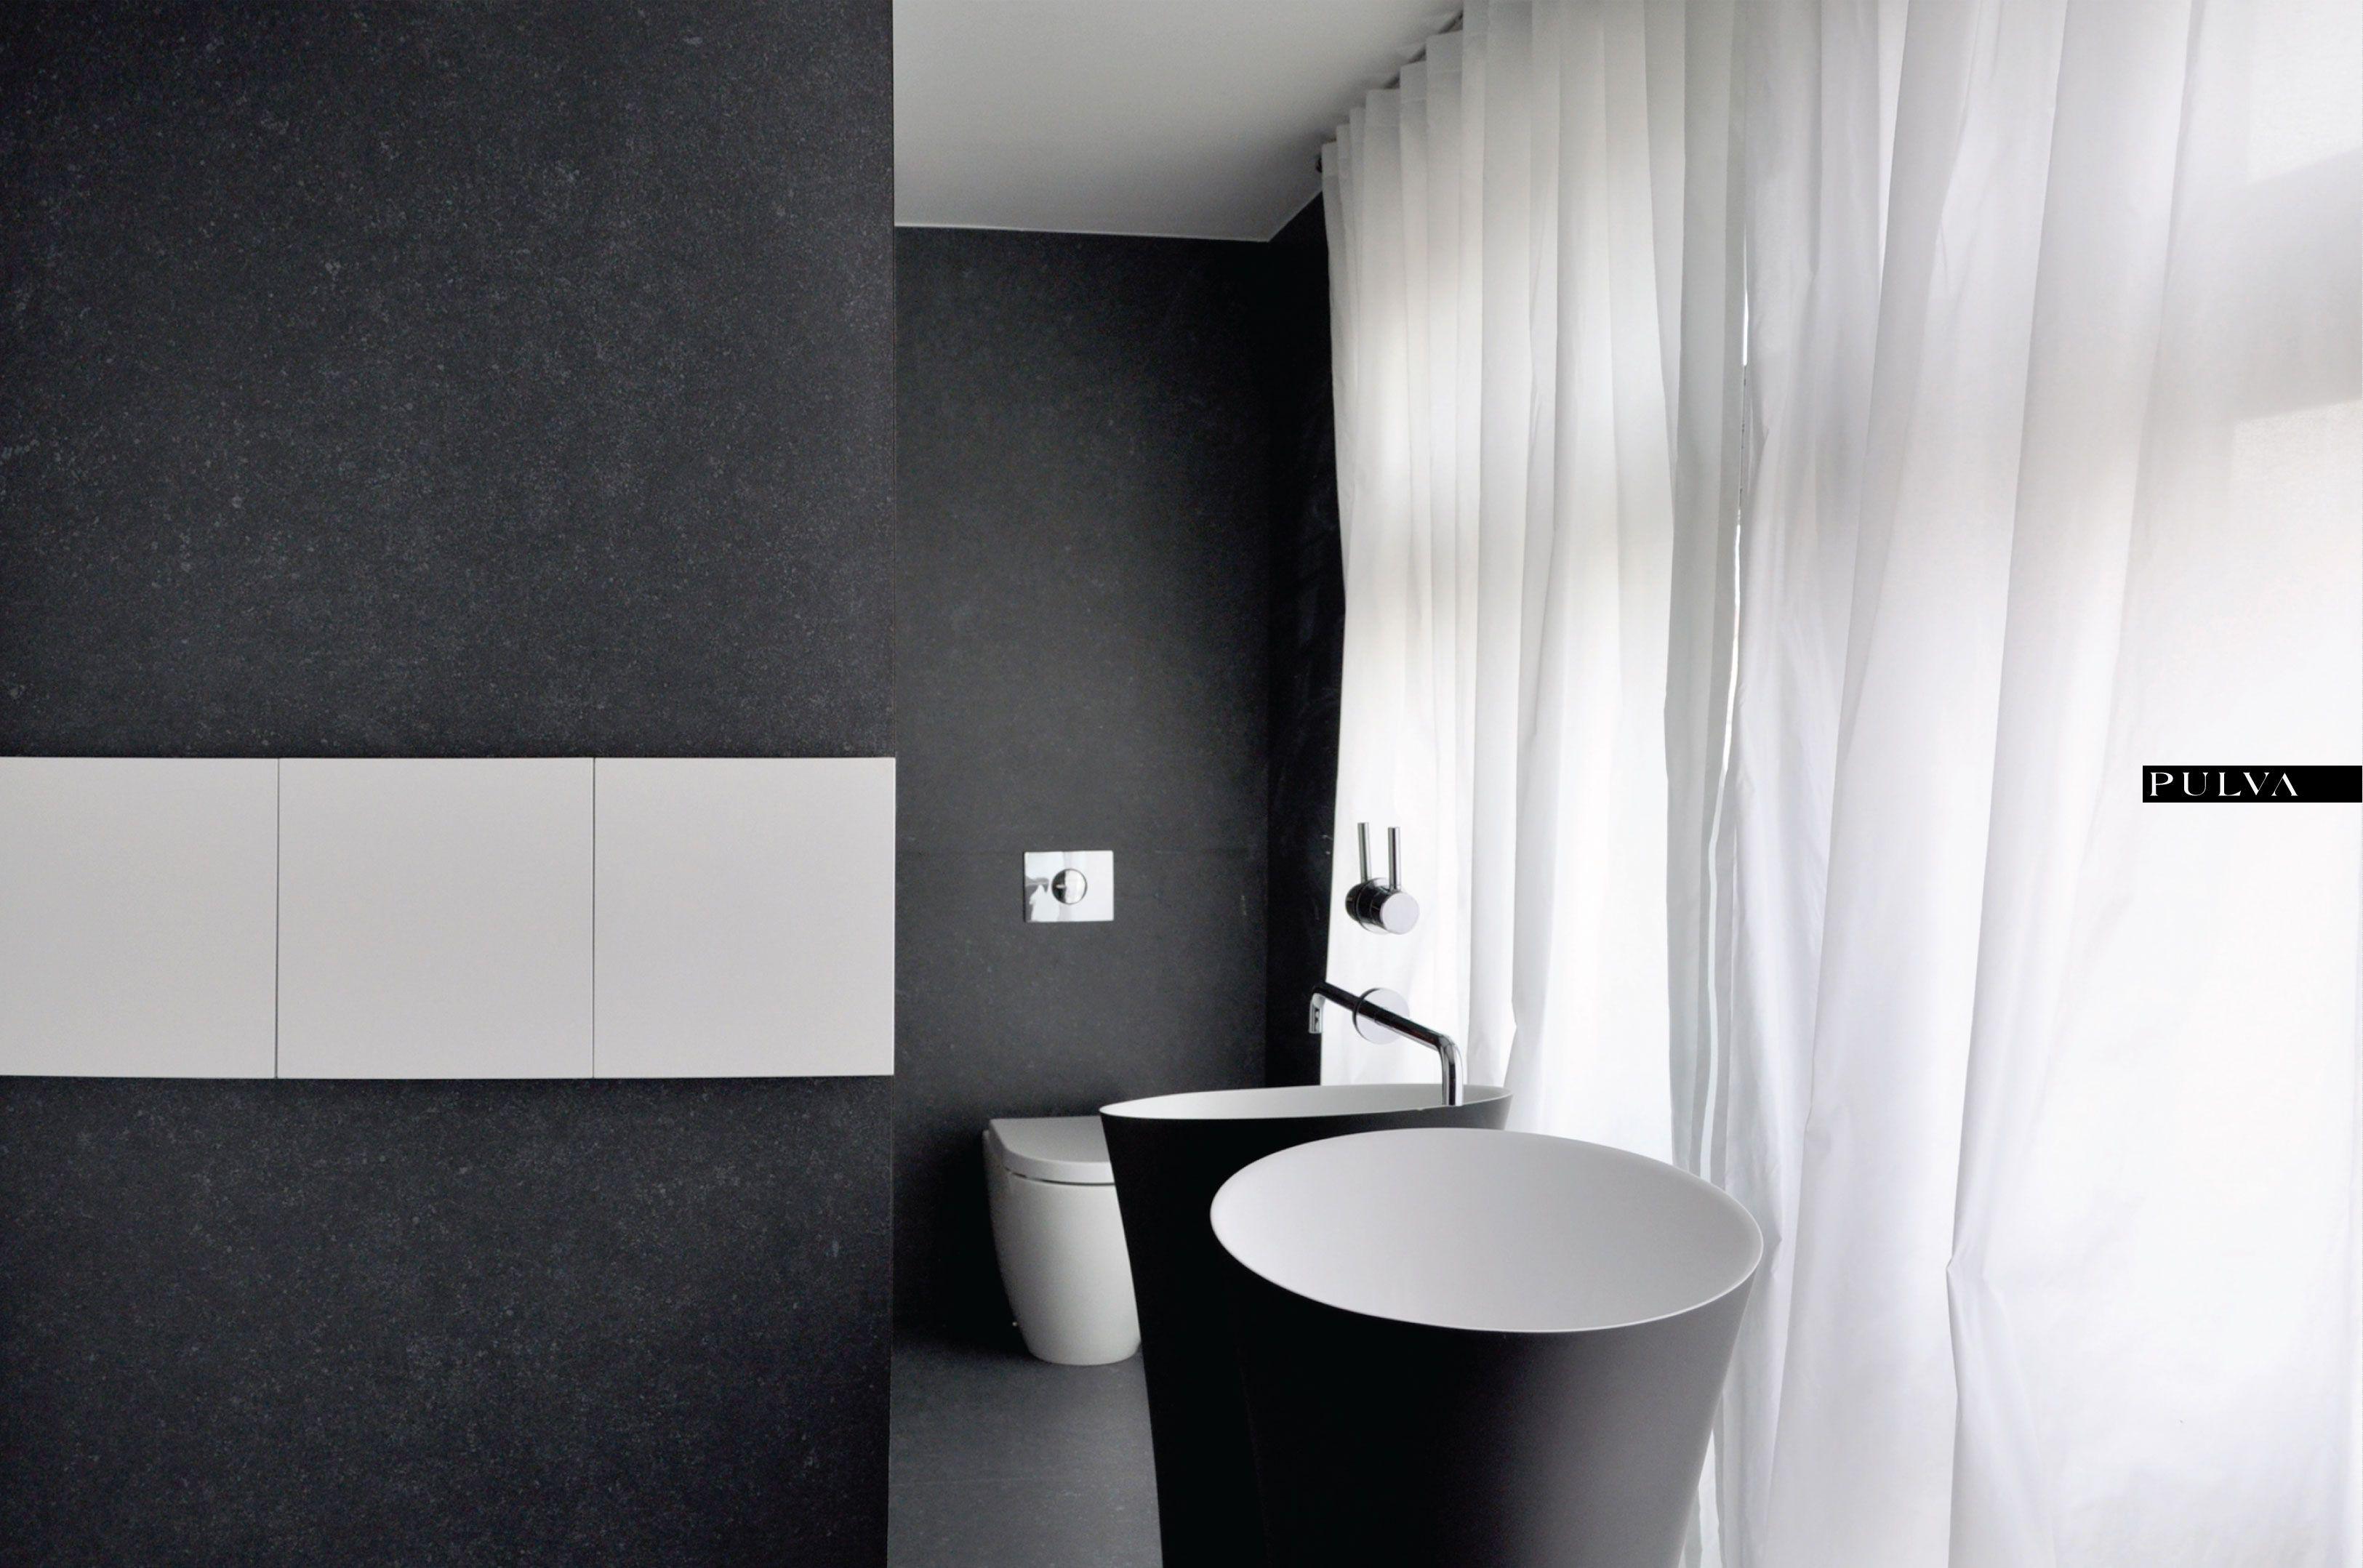 Pin by Patrycja Adamczewska on Interior House styles